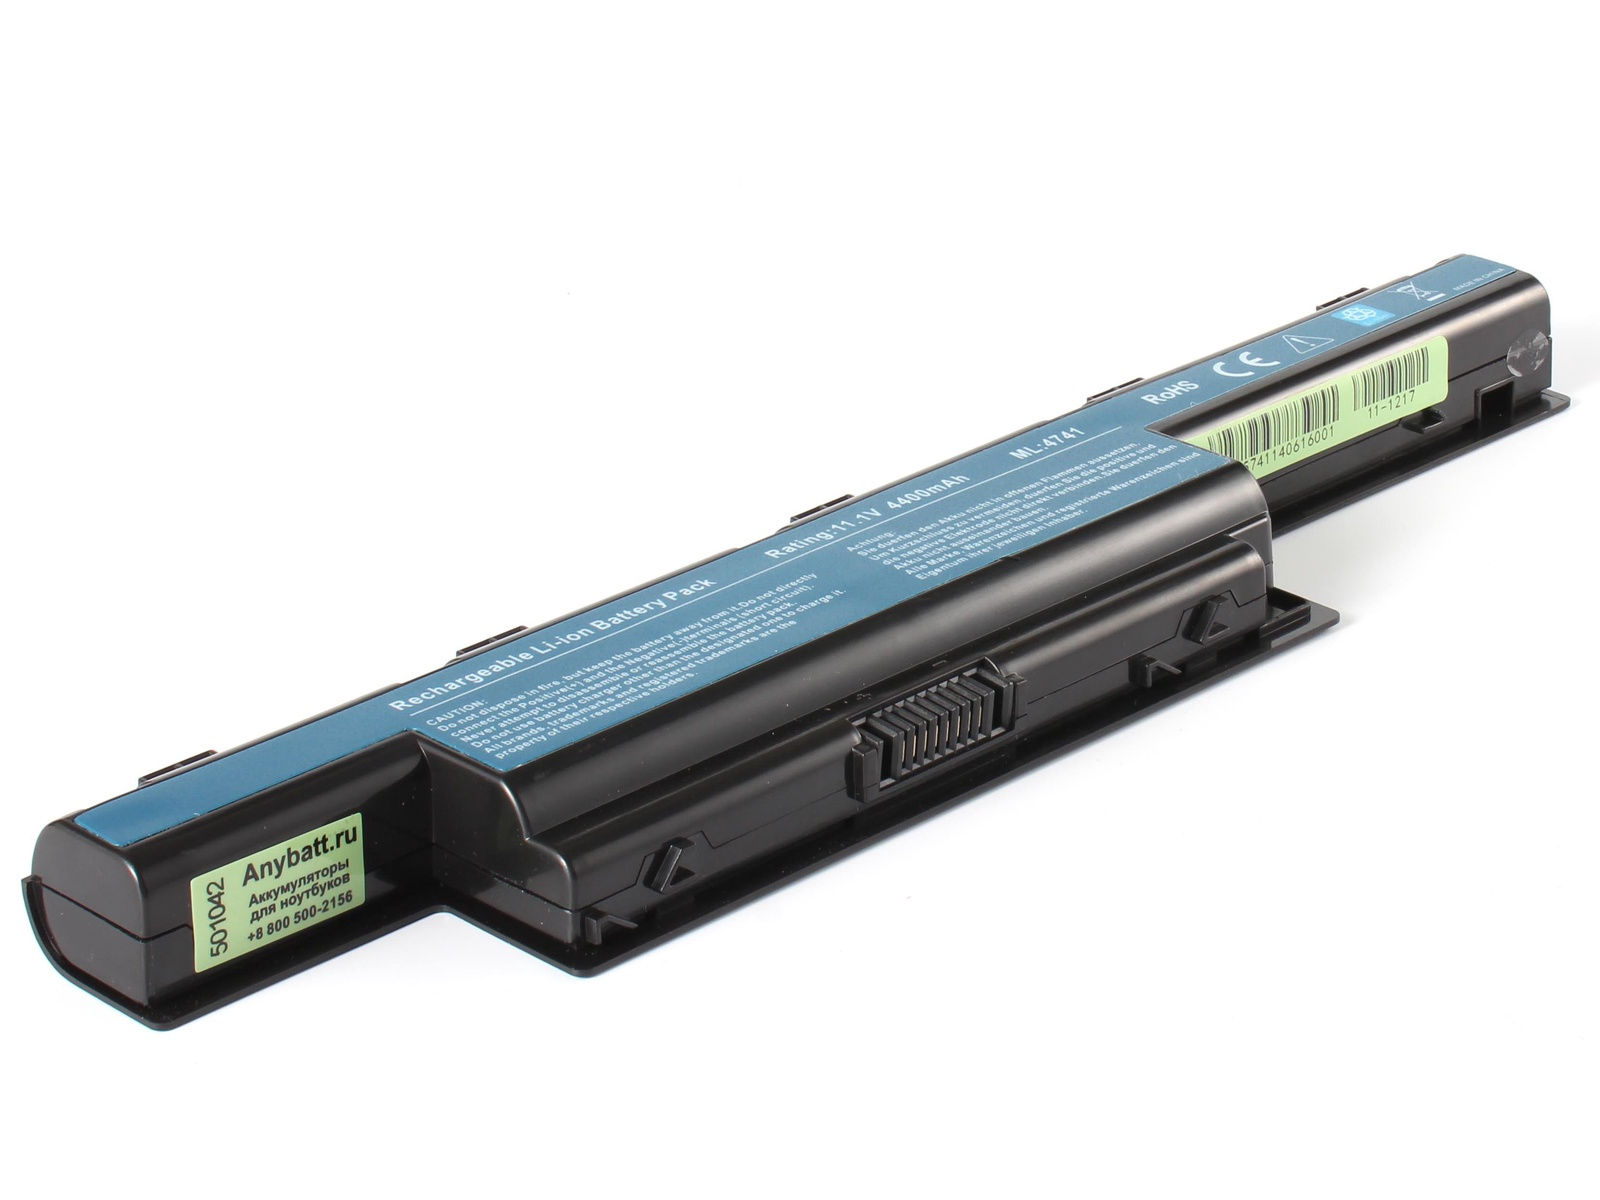 Аккумулятор для ноутбука AnyBatt для Acer Aspire V3-731, Aspire E1-571G-53234G50Mnks, TravelMate 5740, Aspire V3-571G-53236G75Maii, Aspire V3-571G-53216G50Makk, Aspire V3-531, Aspire 4738ZG, Aspire V3-551G-84506G50Makk nokotion laptop motherboard for acer aspire v3 771 e1 731 e1 771 v3 731 va70 vg70 main board nbmg711001 nb mg711 001 ddr3 works